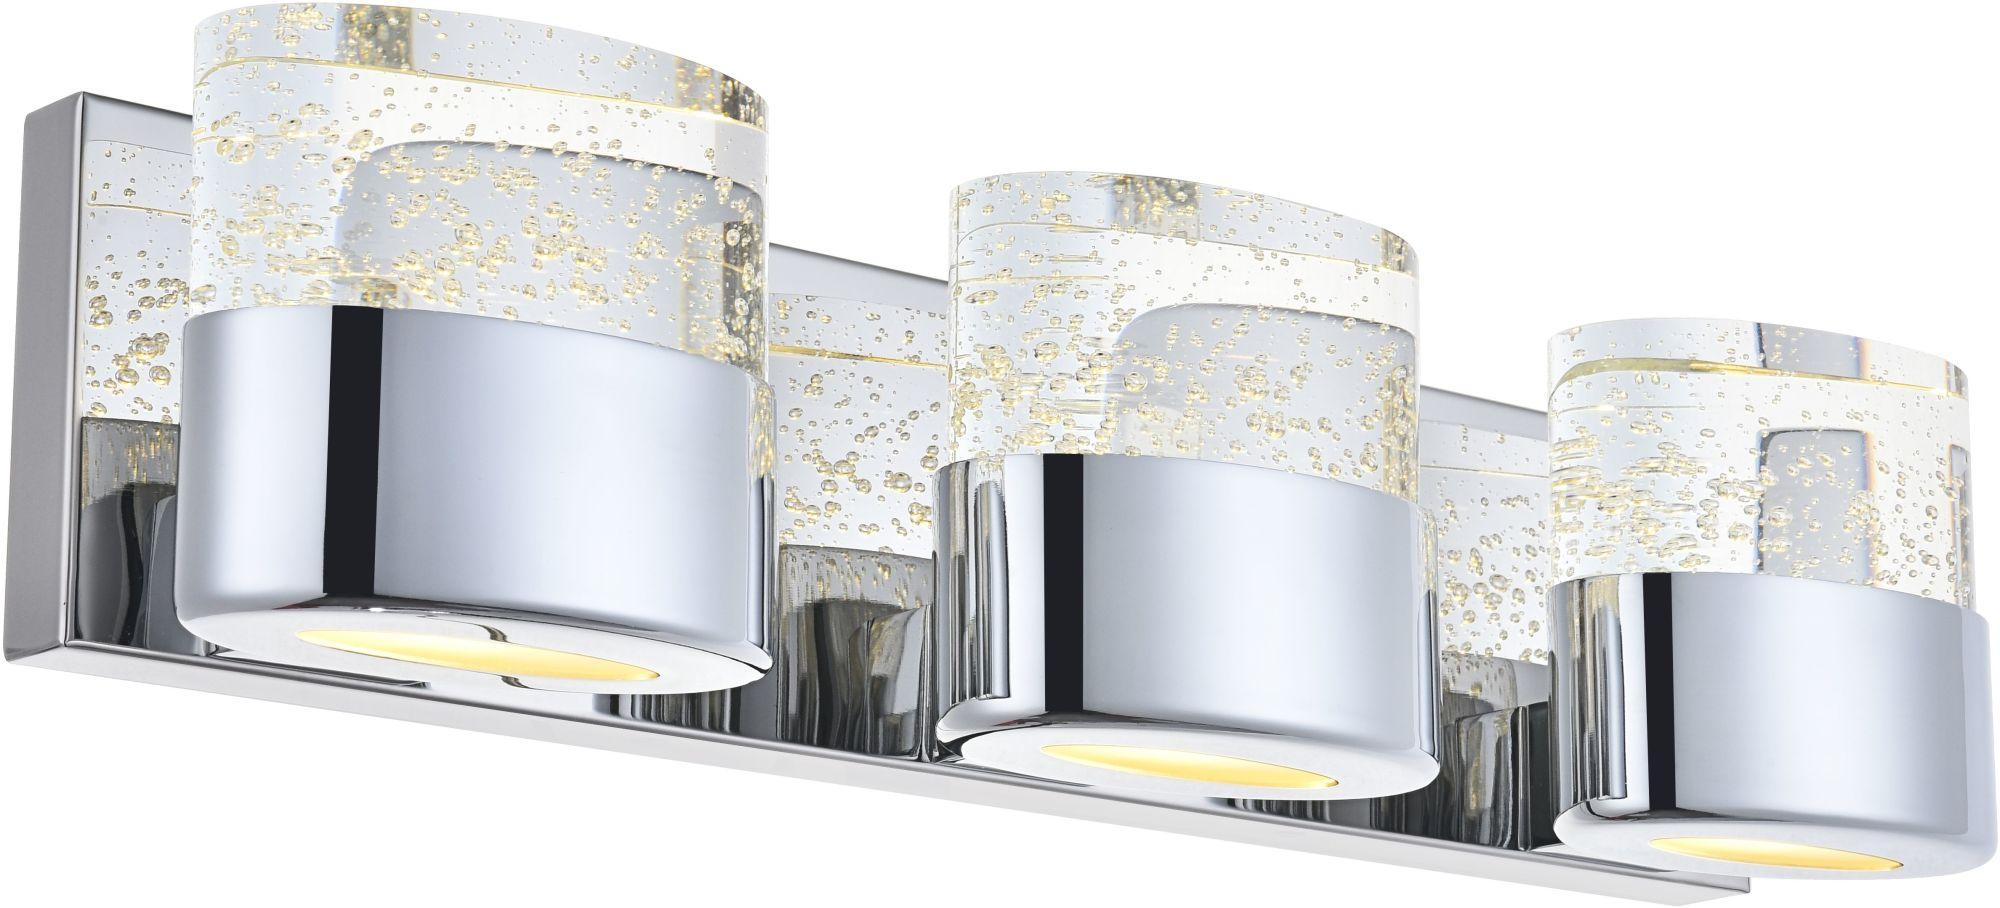 Elegant Lighting 5301w19 Pollux 6 Light 19 Wide Integrated Led Bathroom Vanity Light Walmart Com Walmart Com